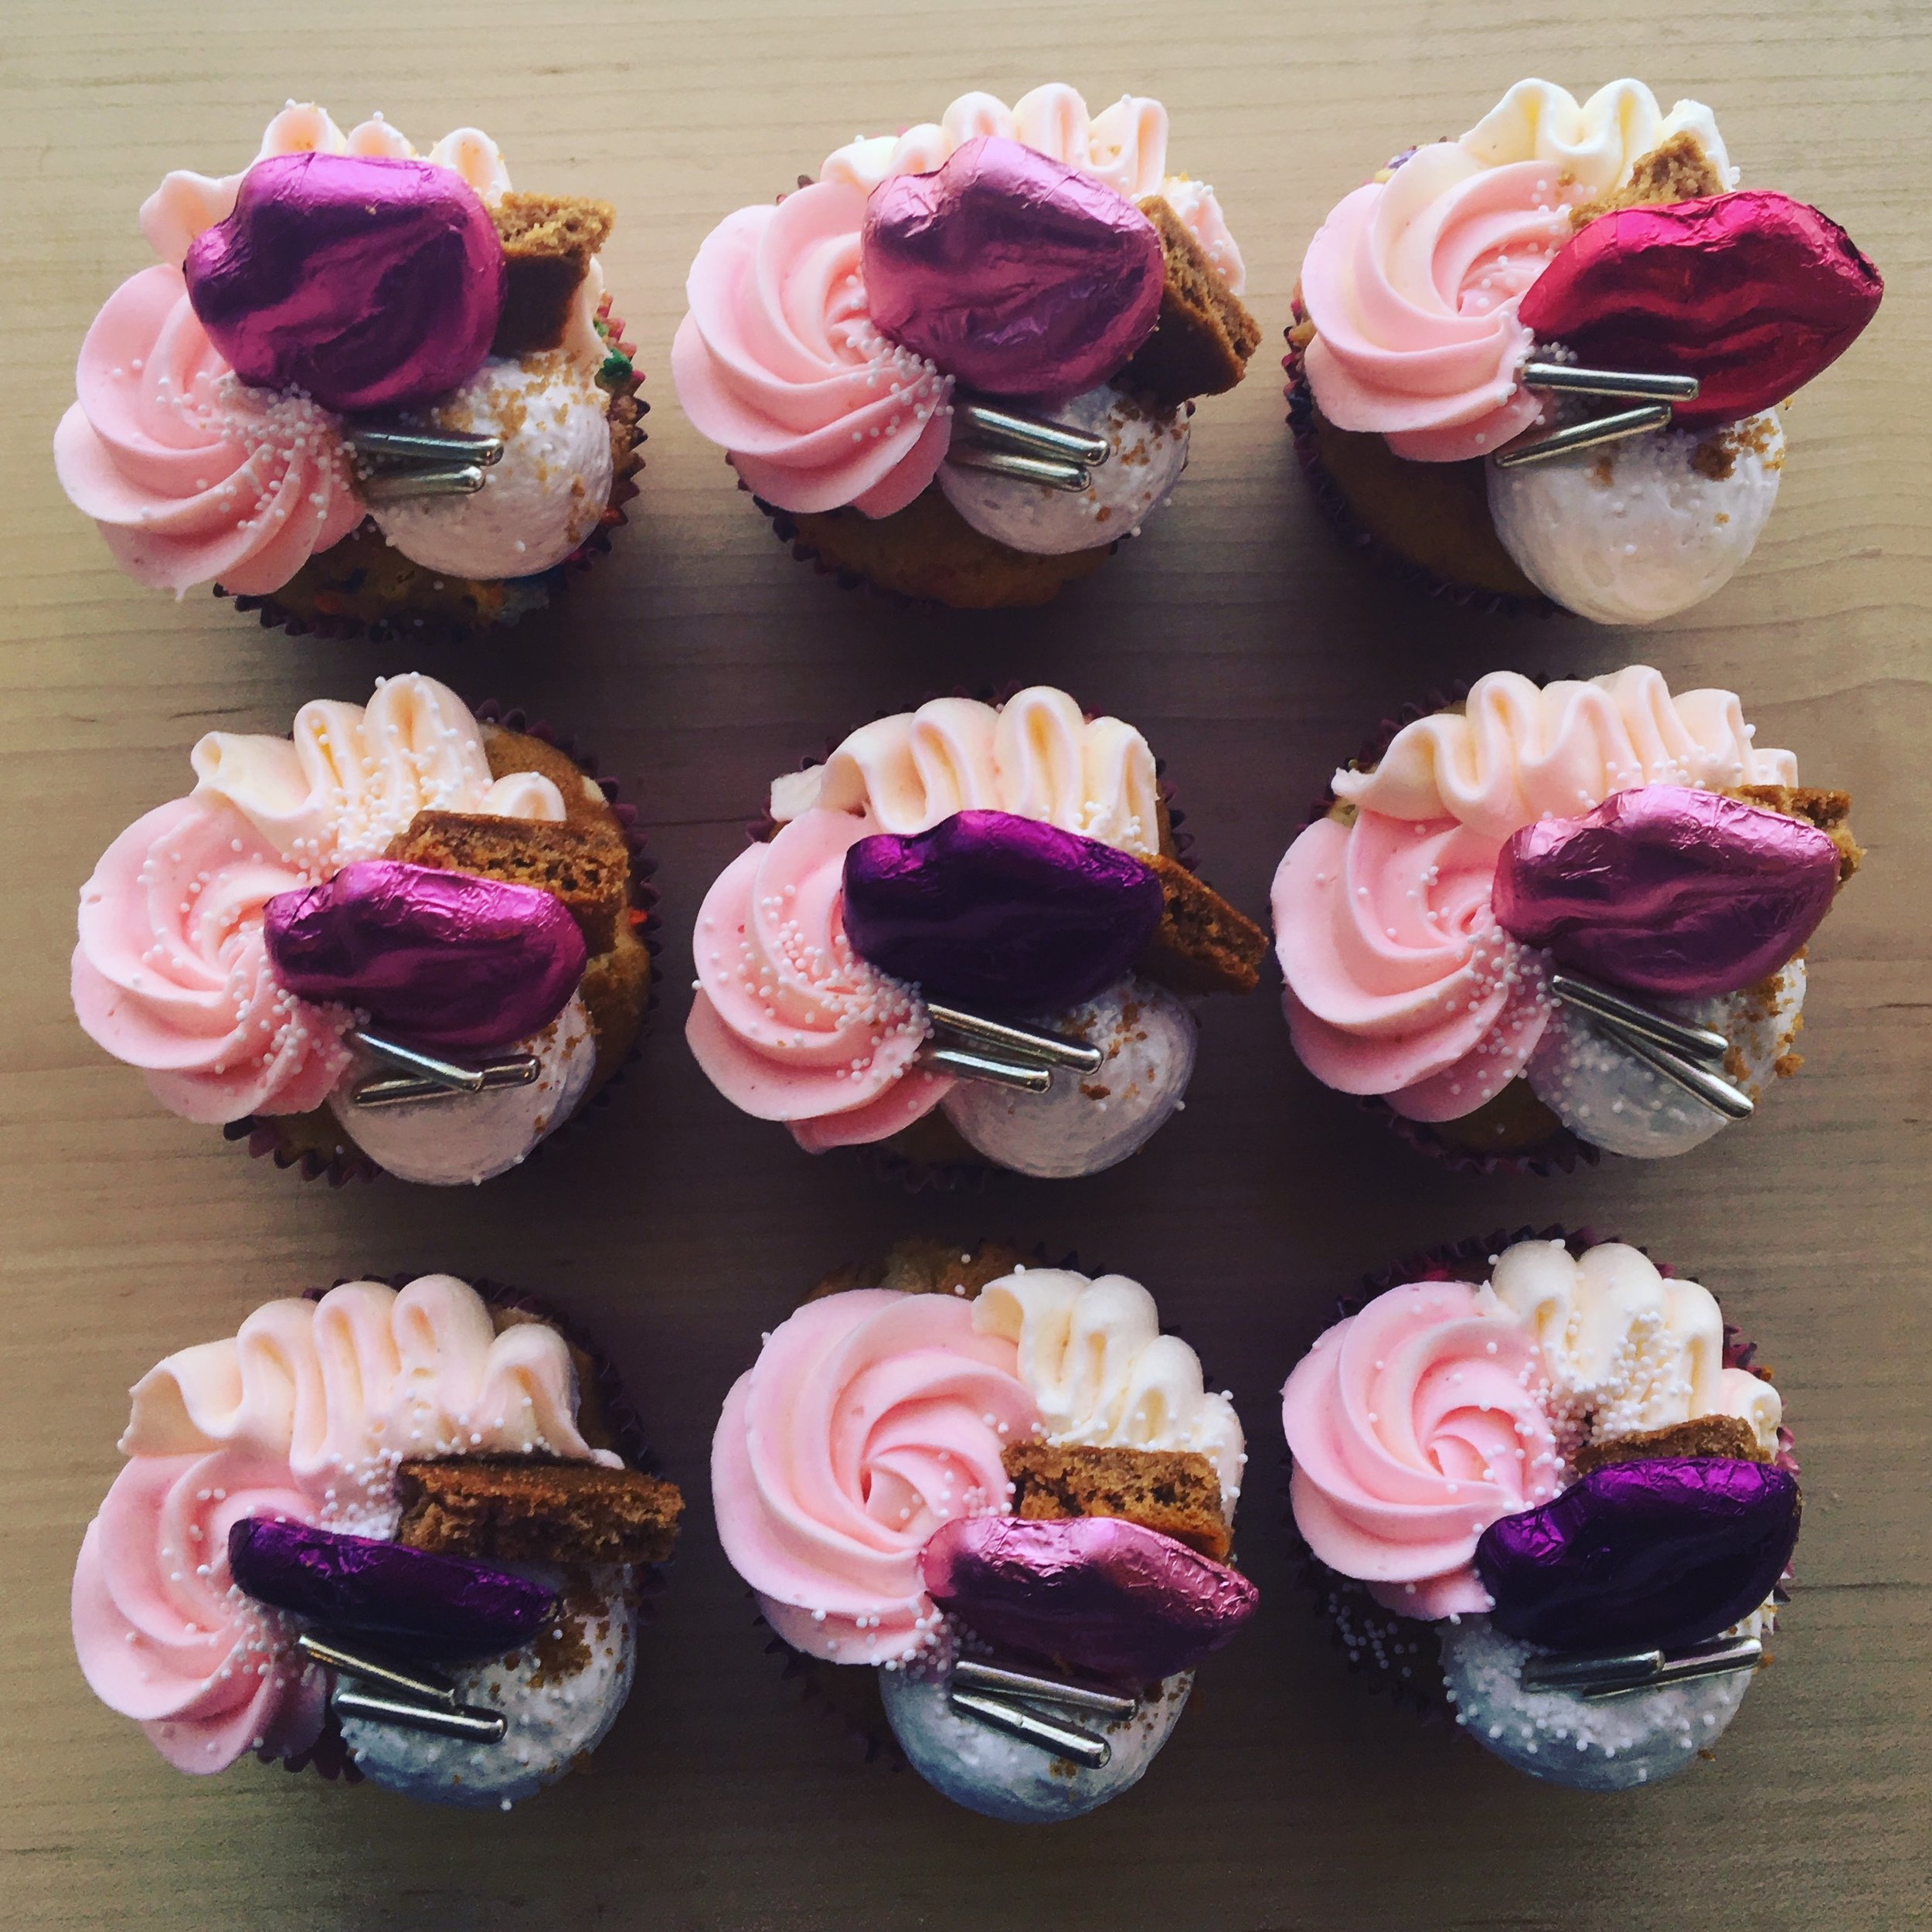 ECBG Cake Studio - custom cupcakes   Chicago Il.jpg